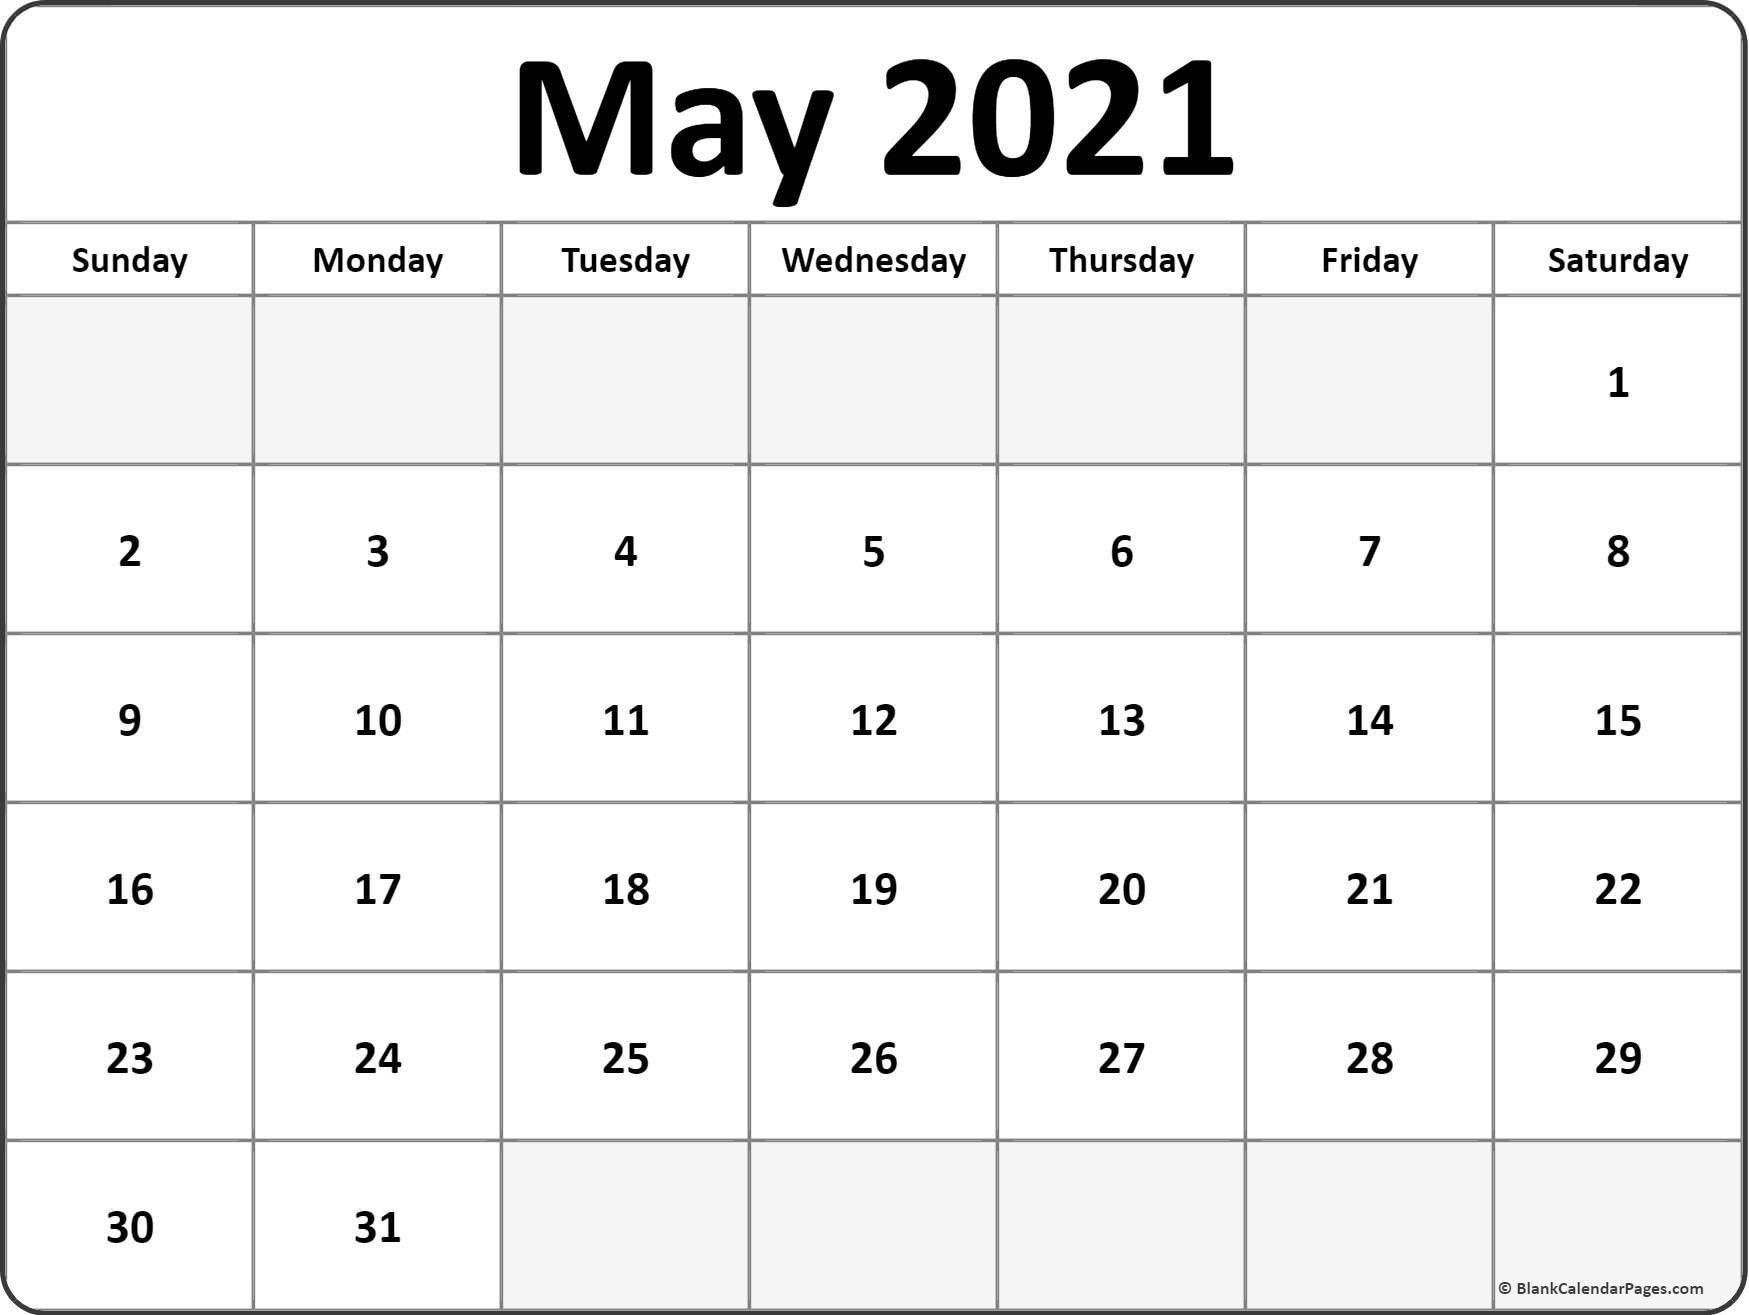 May 2021 Calendar Free Printable Monthly Calendars 1 - Calendar Template 2021 throughout 2021 Weekly Calendars Printable Free Image